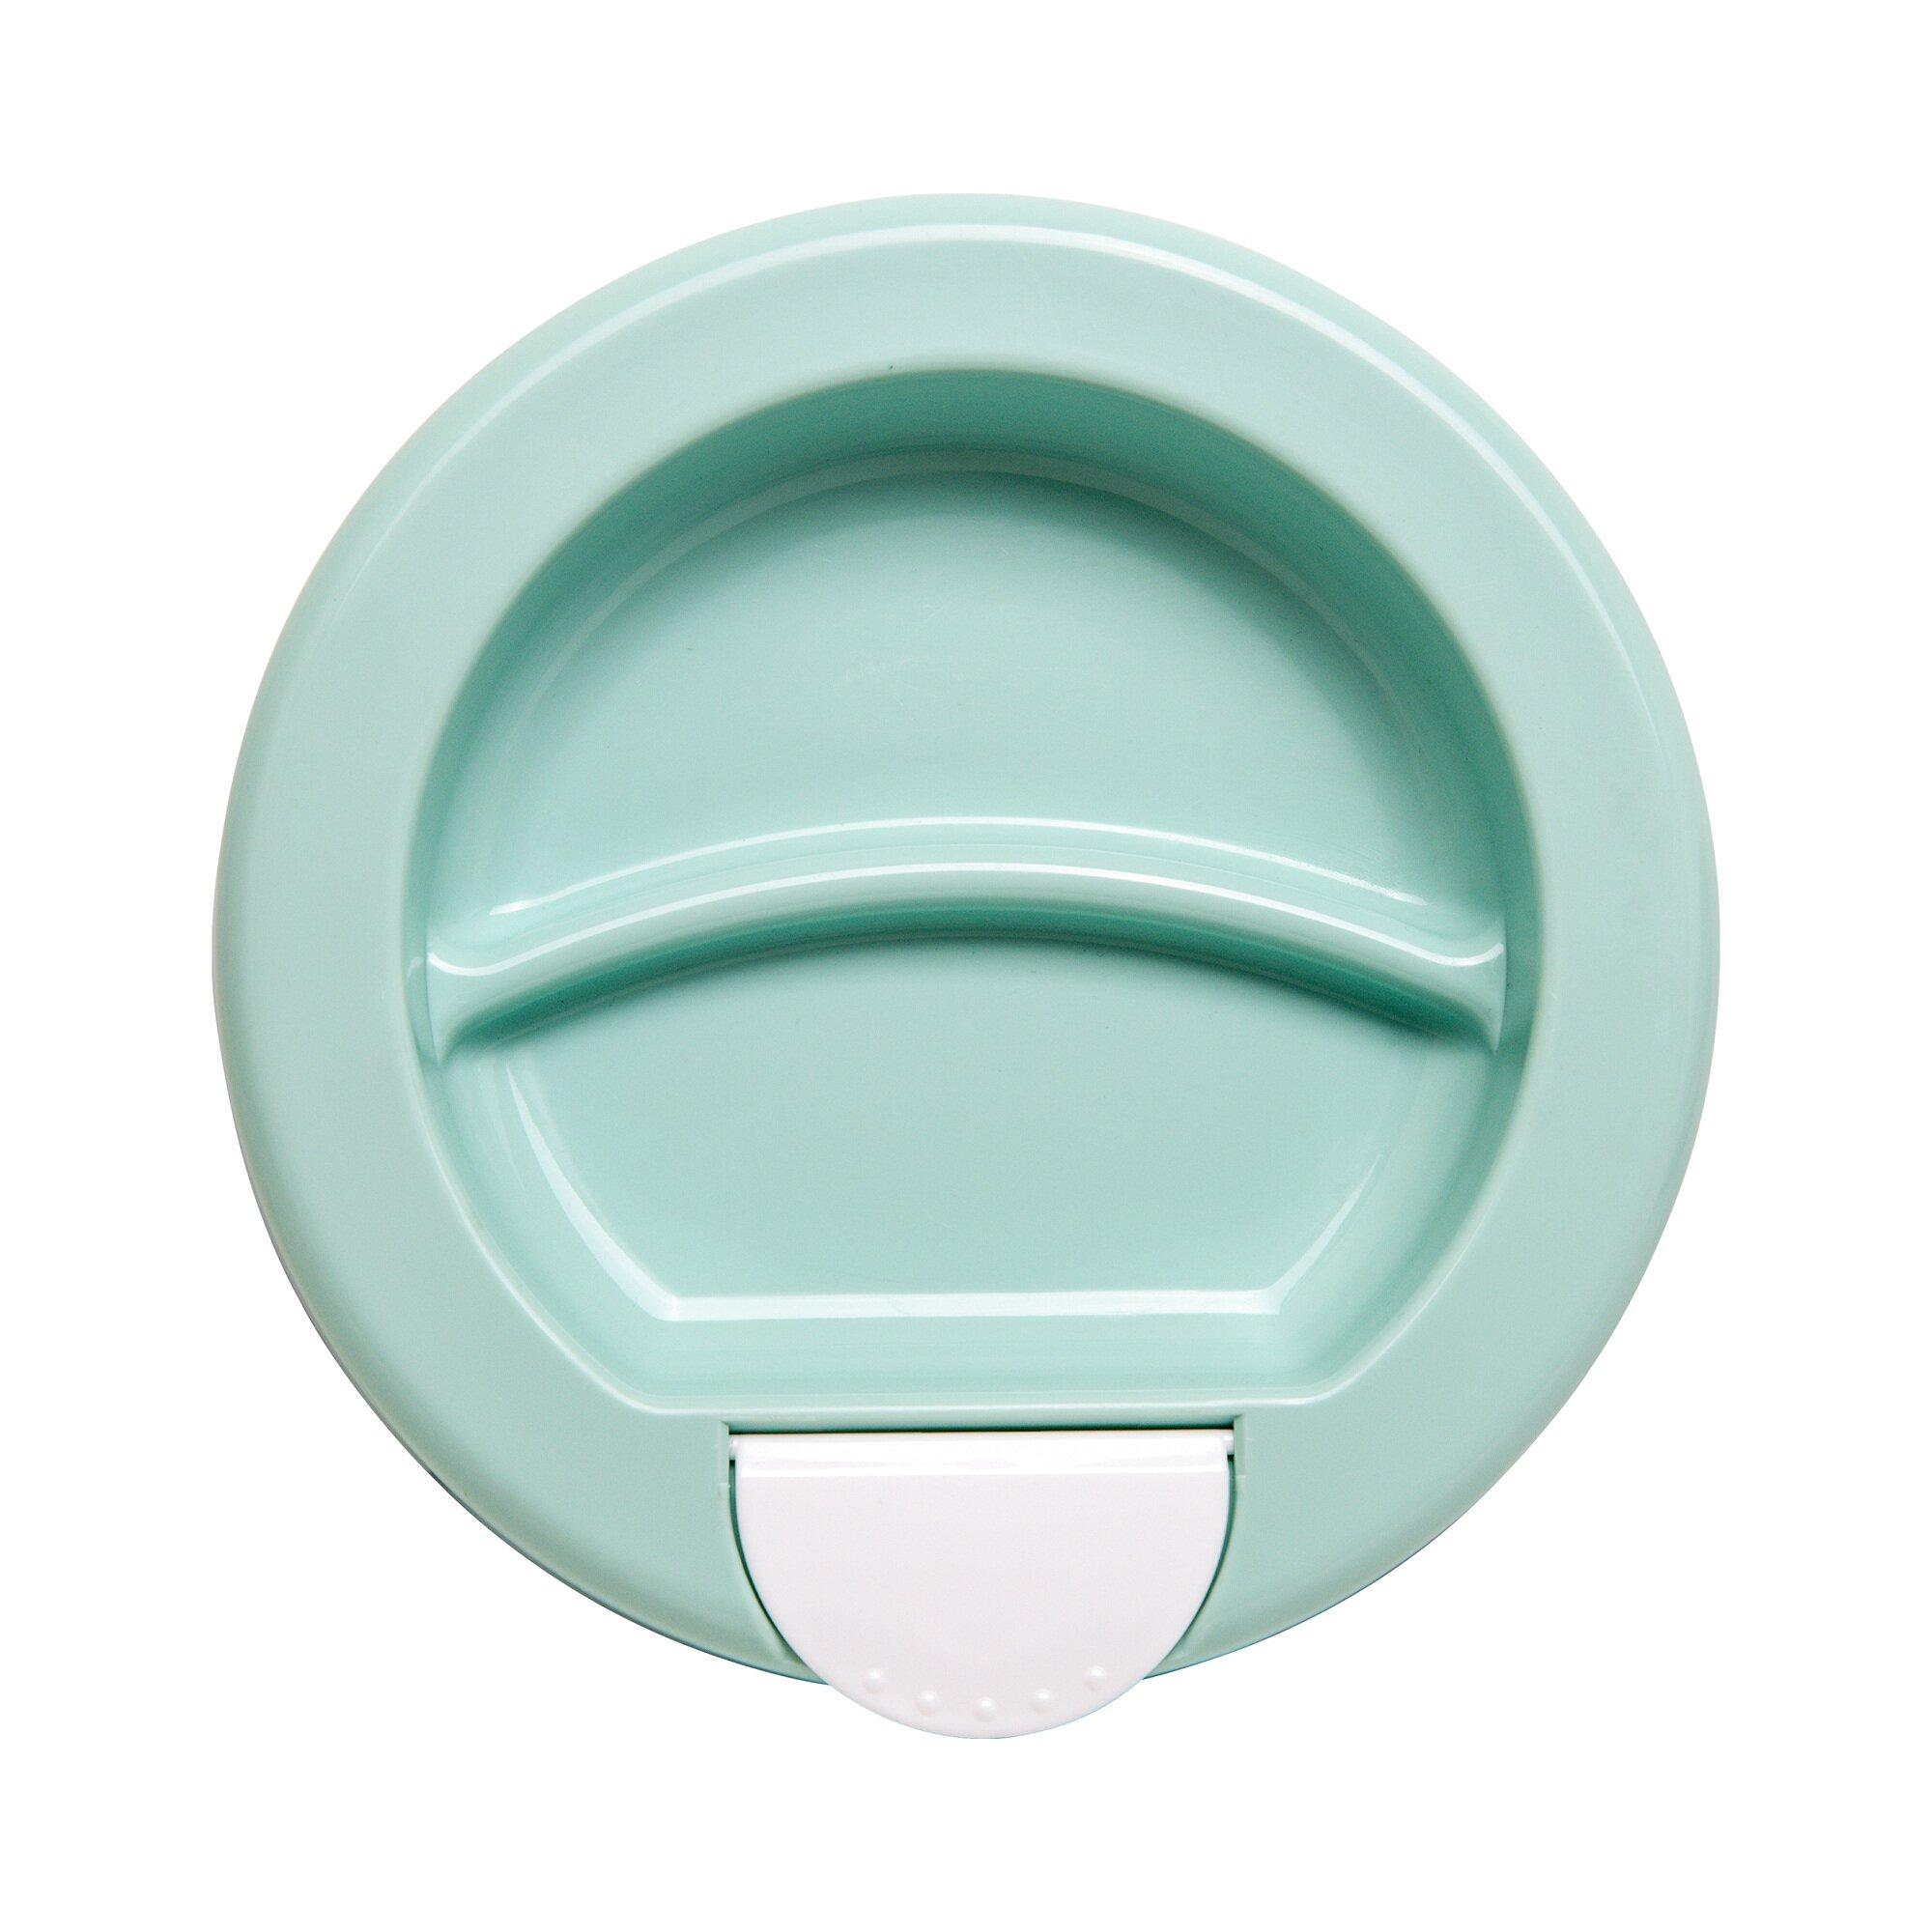 rotho-babydesign-warmhalteteller-modern-feeding